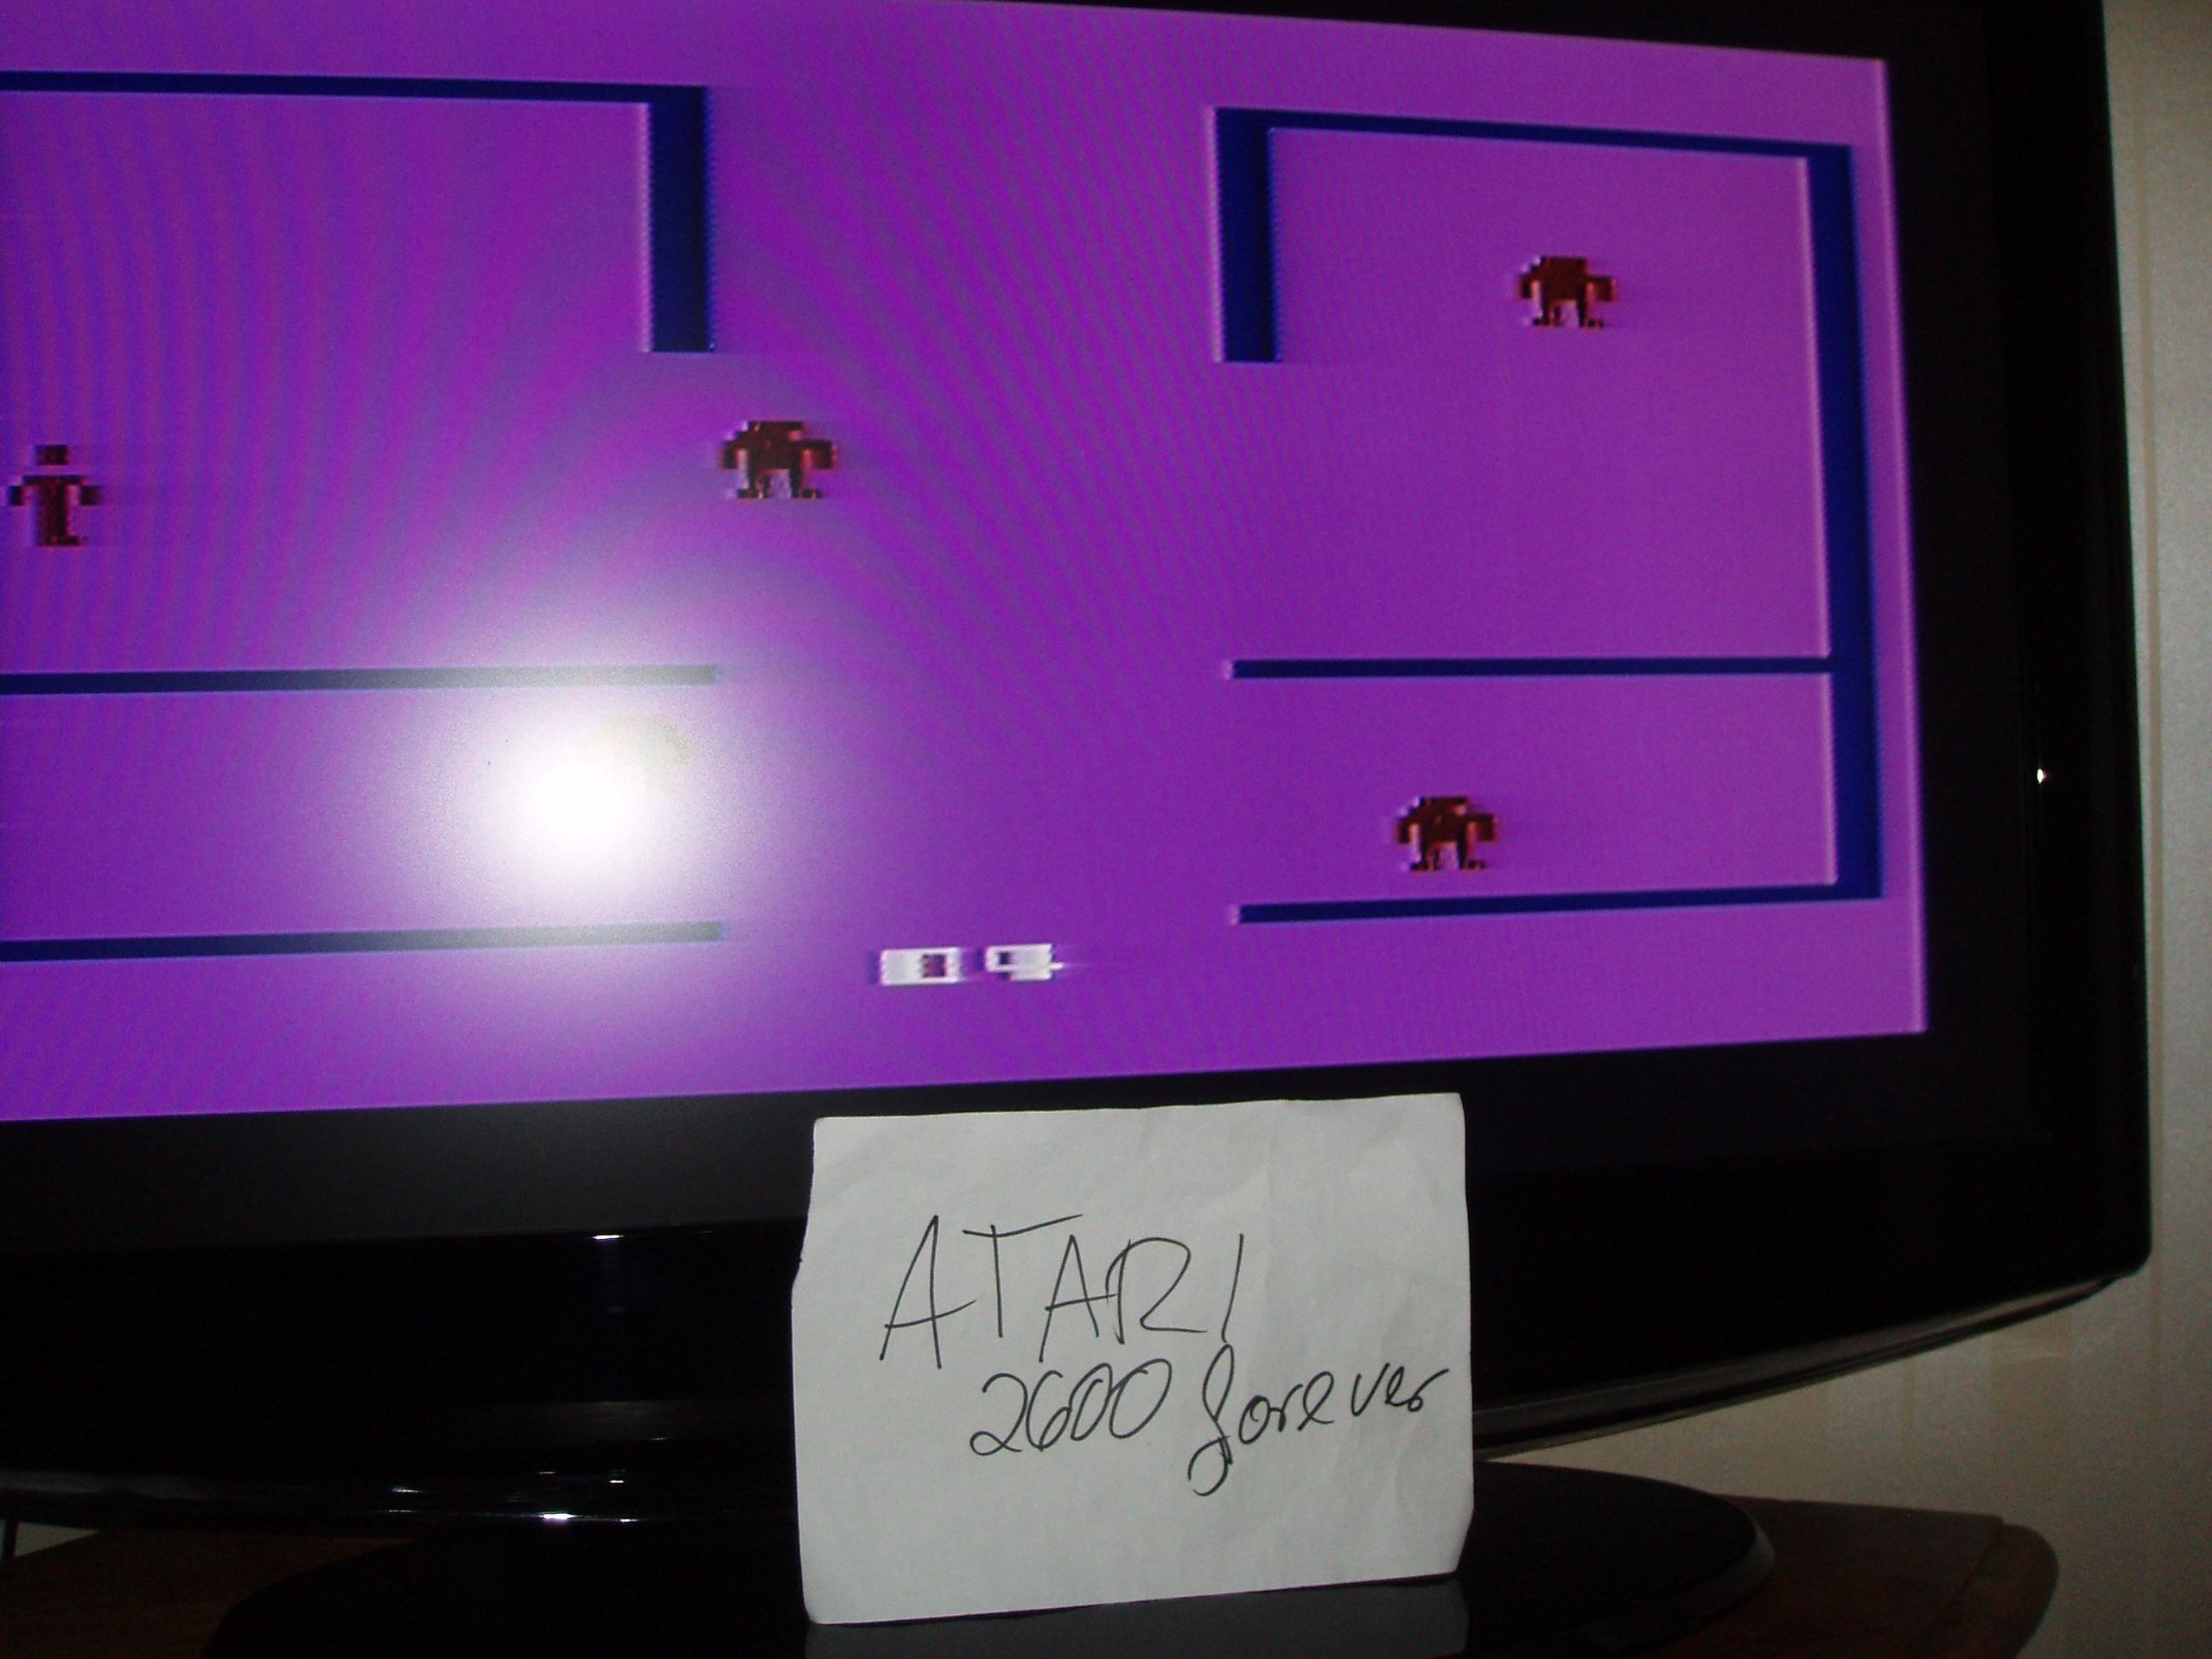 atari2600forever: Berzerk: Game 4 (Atari 2600) 9,830 points on 2019-01-17 05:12:45